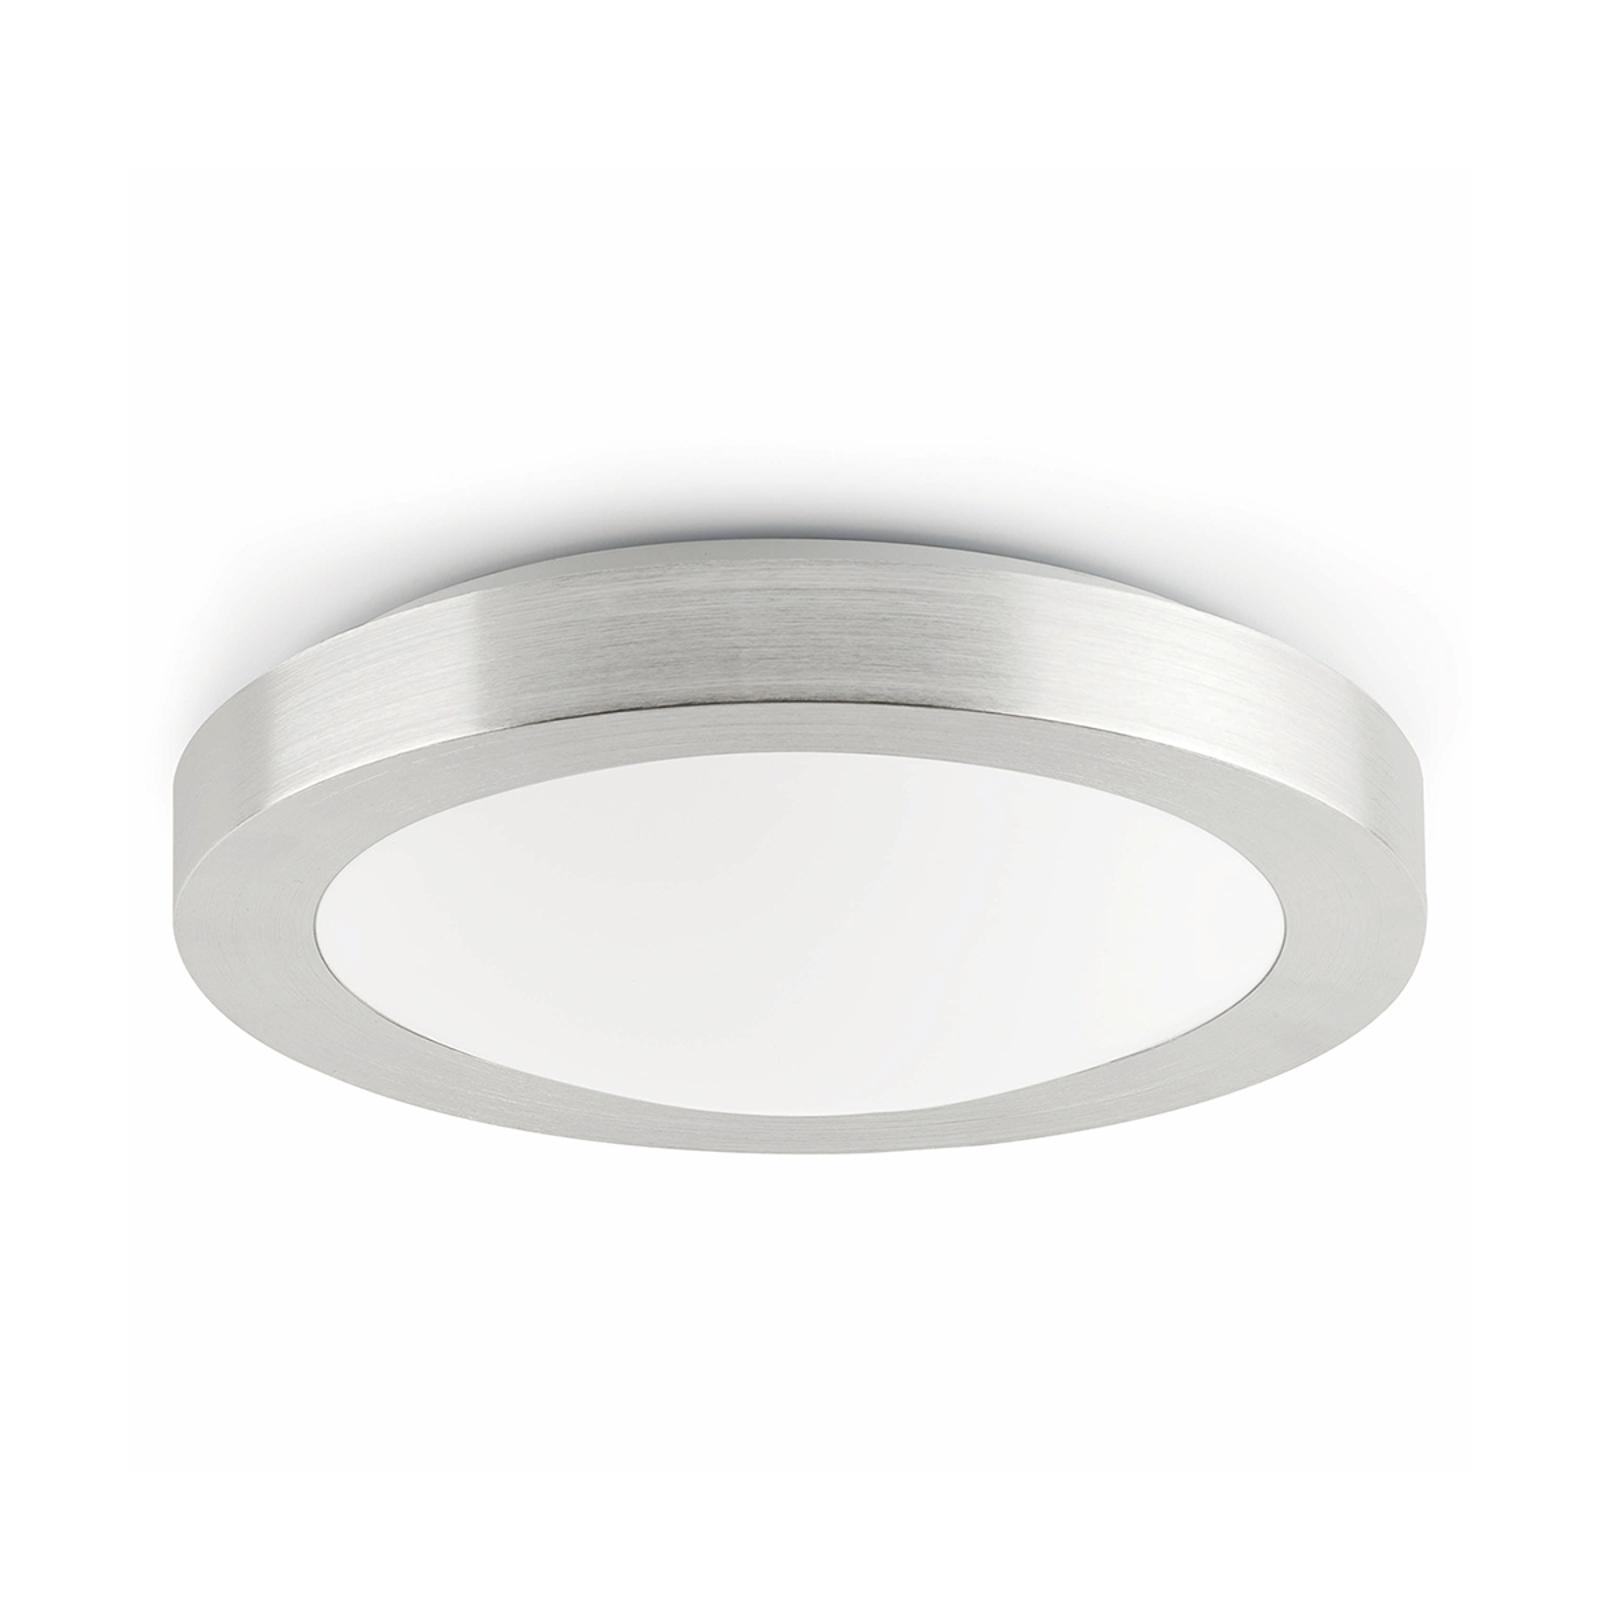 Funkcjonalna lampa sufitowa LOGOS 35 cm